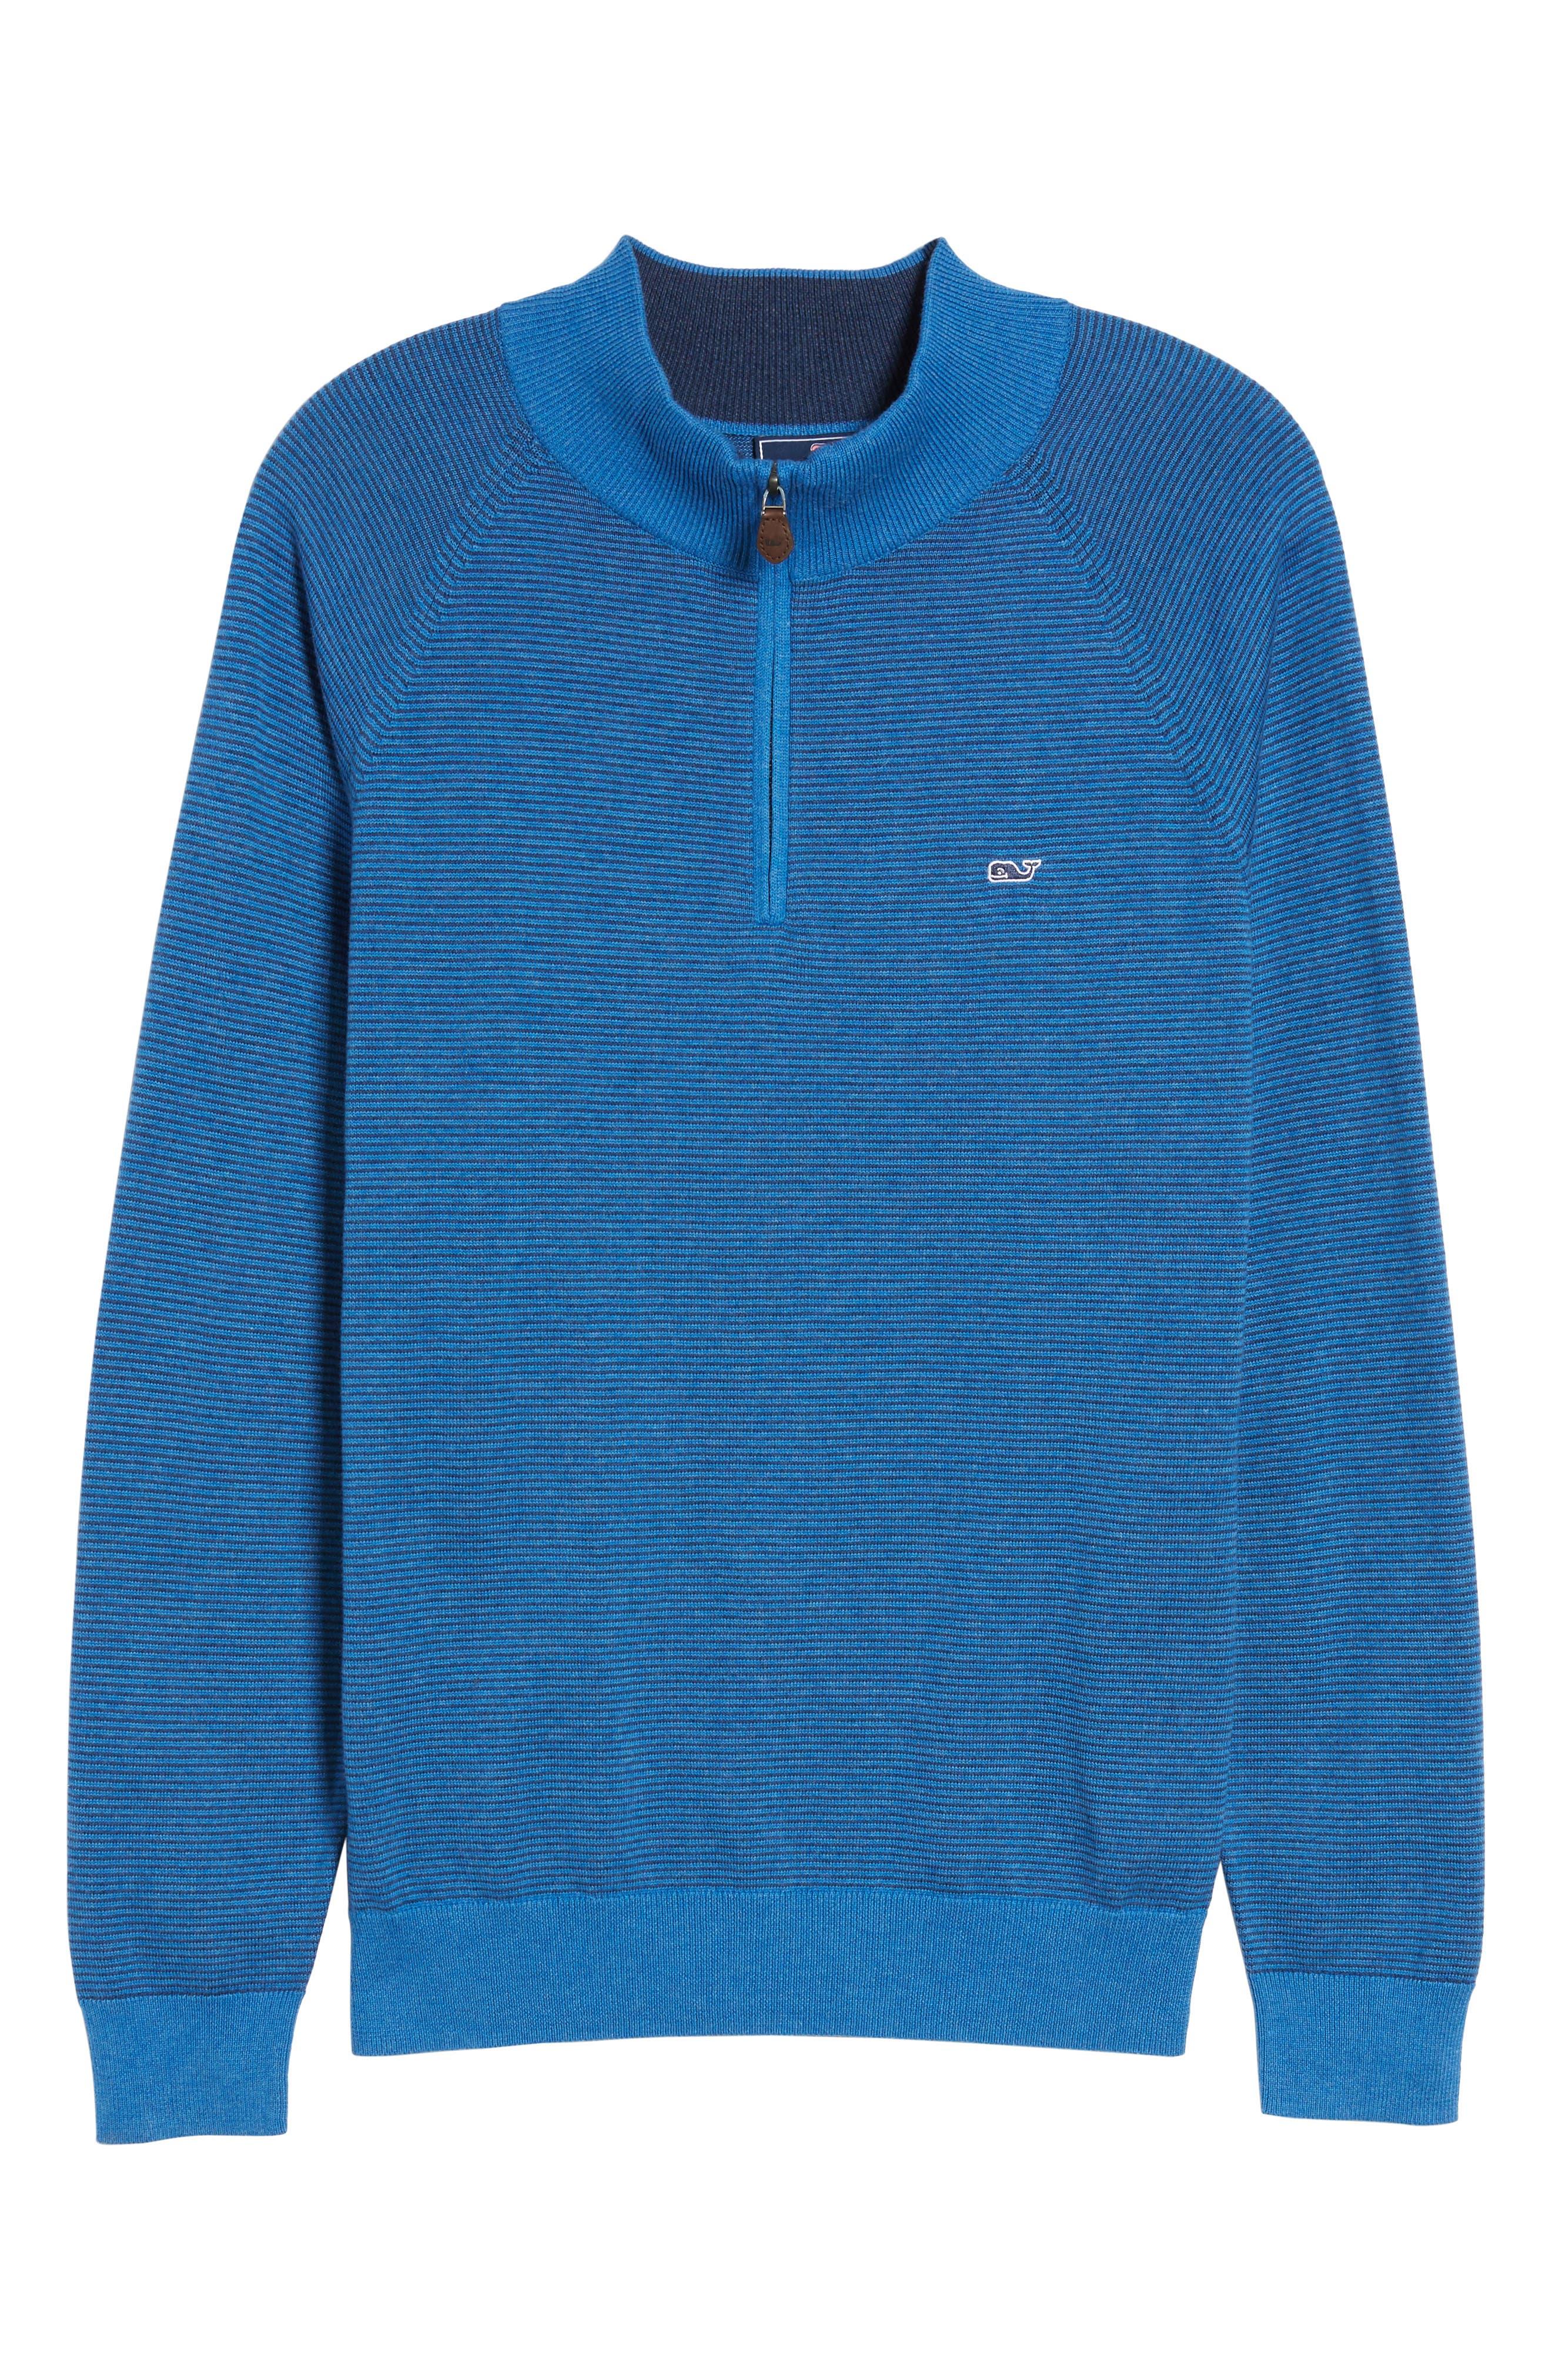 Fine Stripe Quarter Zip Sweater,                             Alternate thumbnail 6, color,                             Regatta Blue